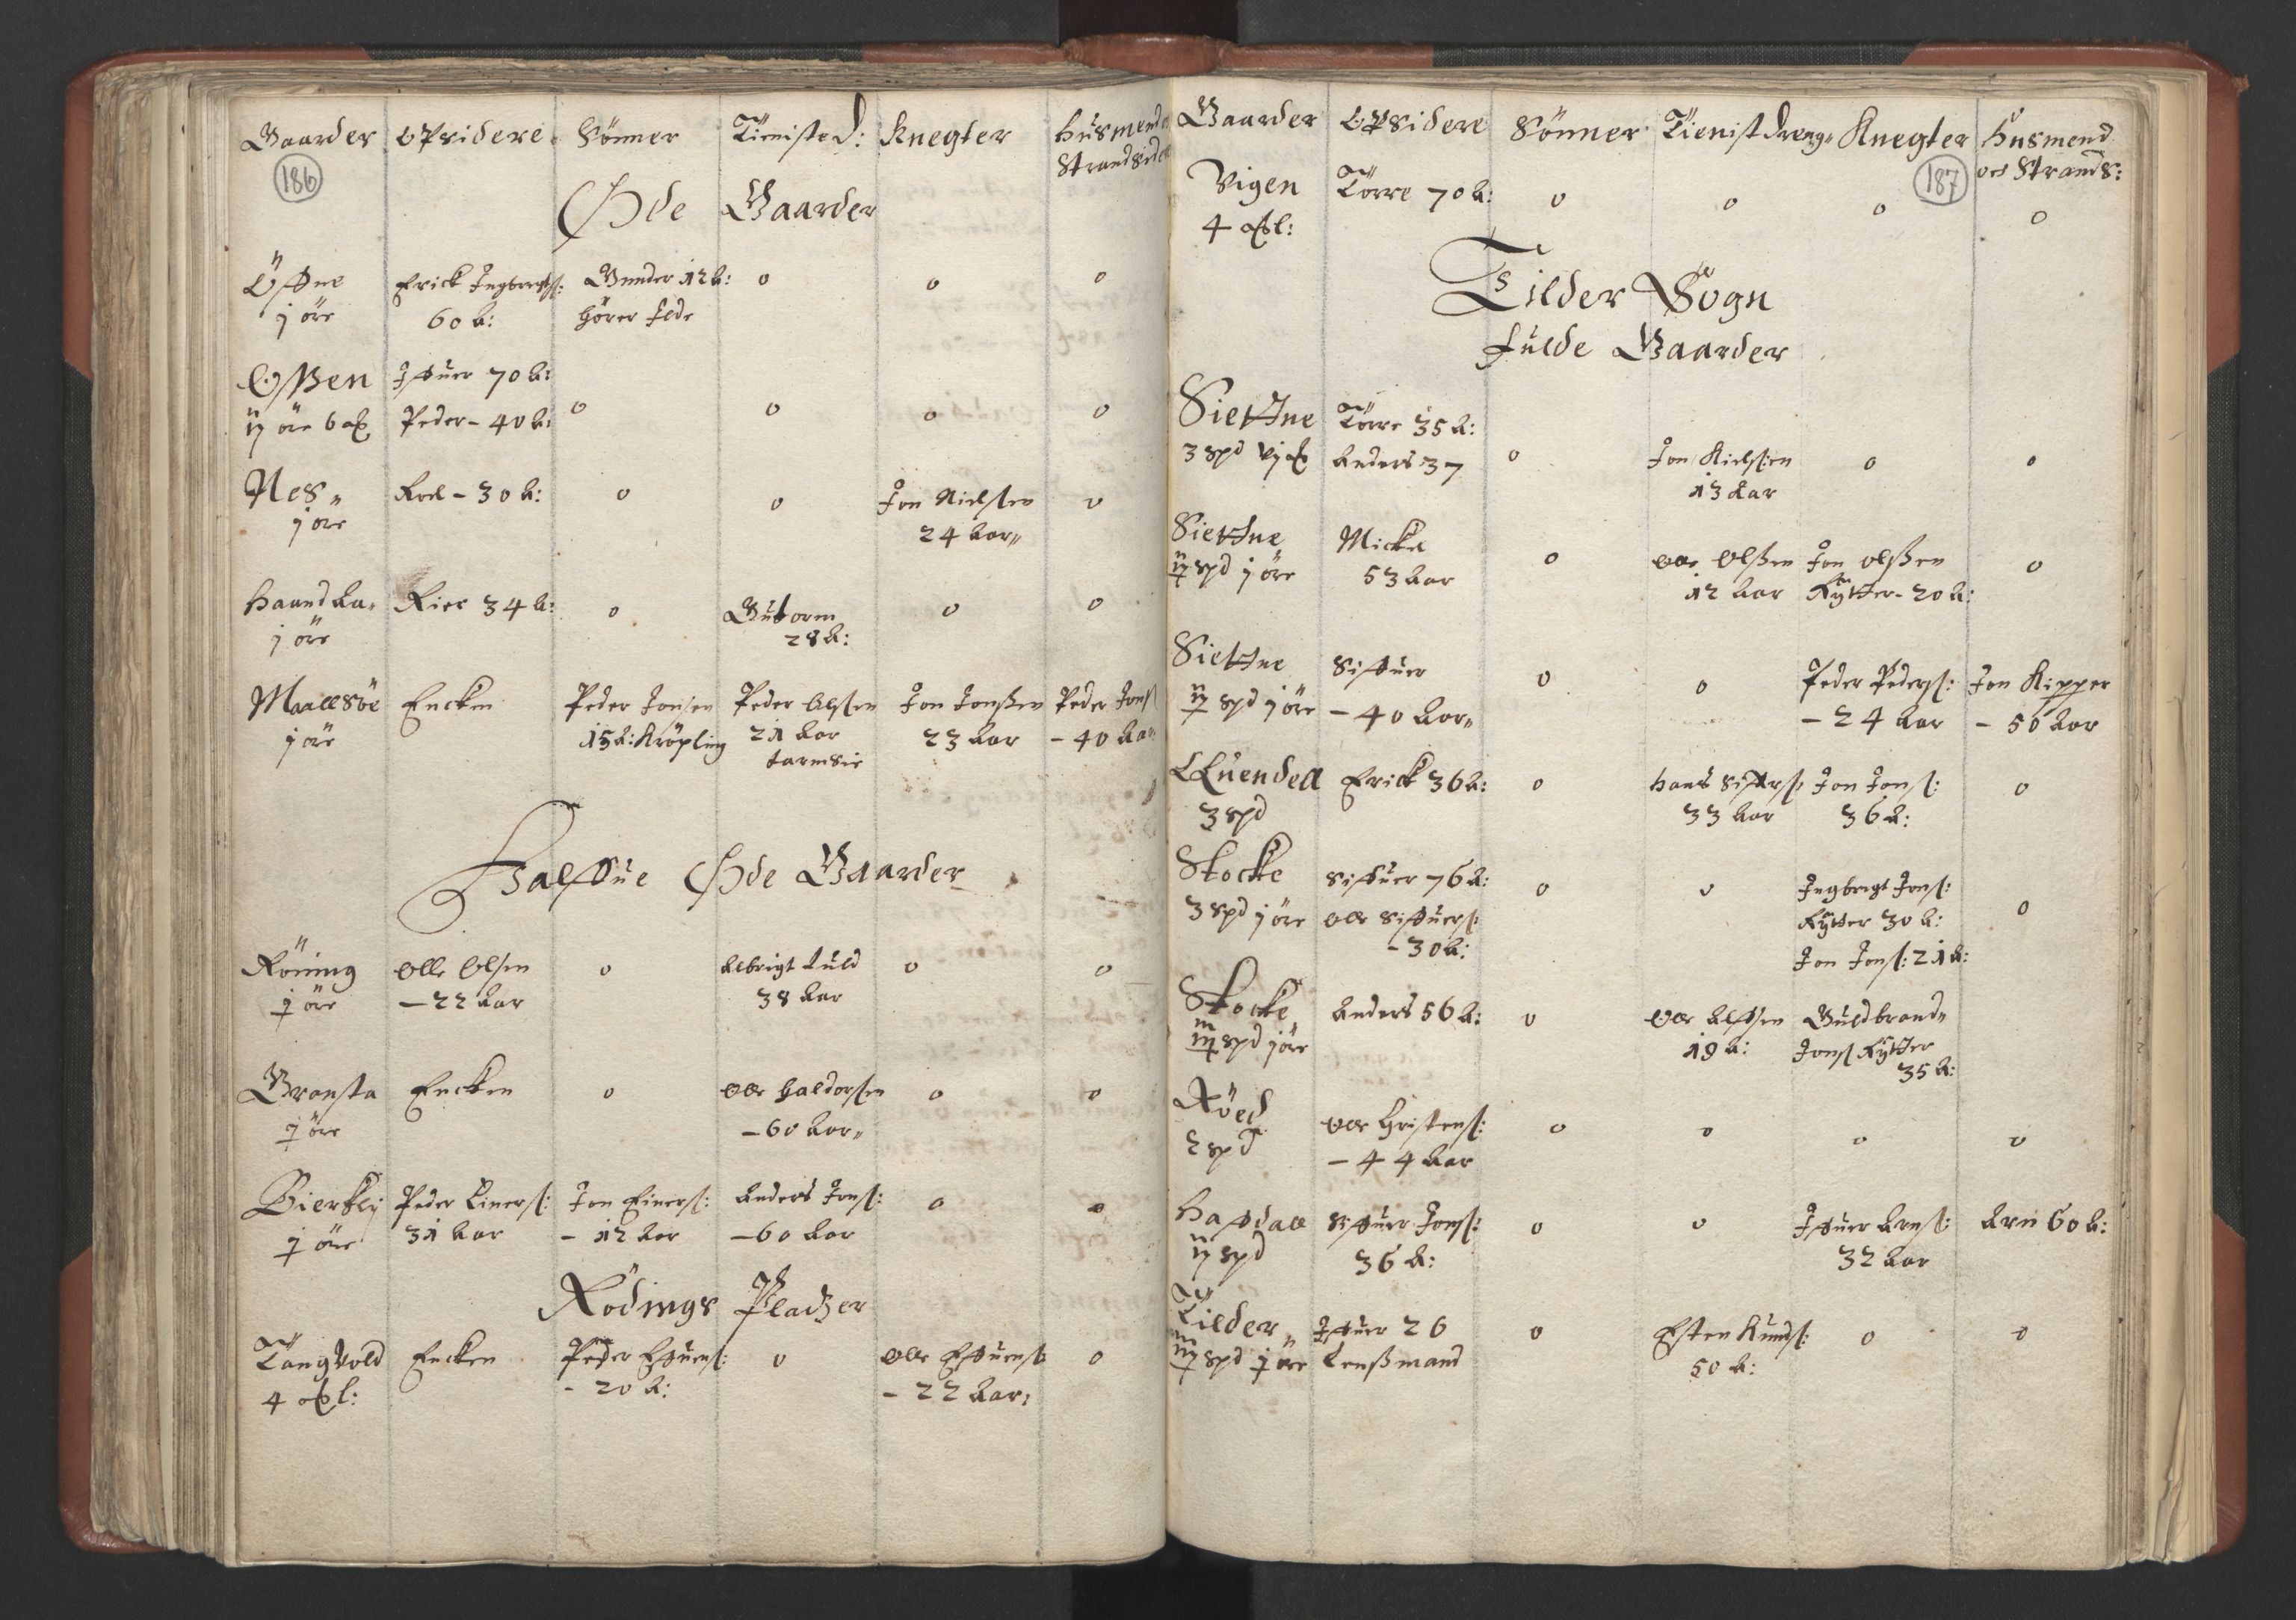 RA, Fogdenes og sorenskrivernes manntall 1664-1666, nr. 18: Gauldal fogderi, Strinda fogderi og Orkdal fogderi, 1664, s. 186-187